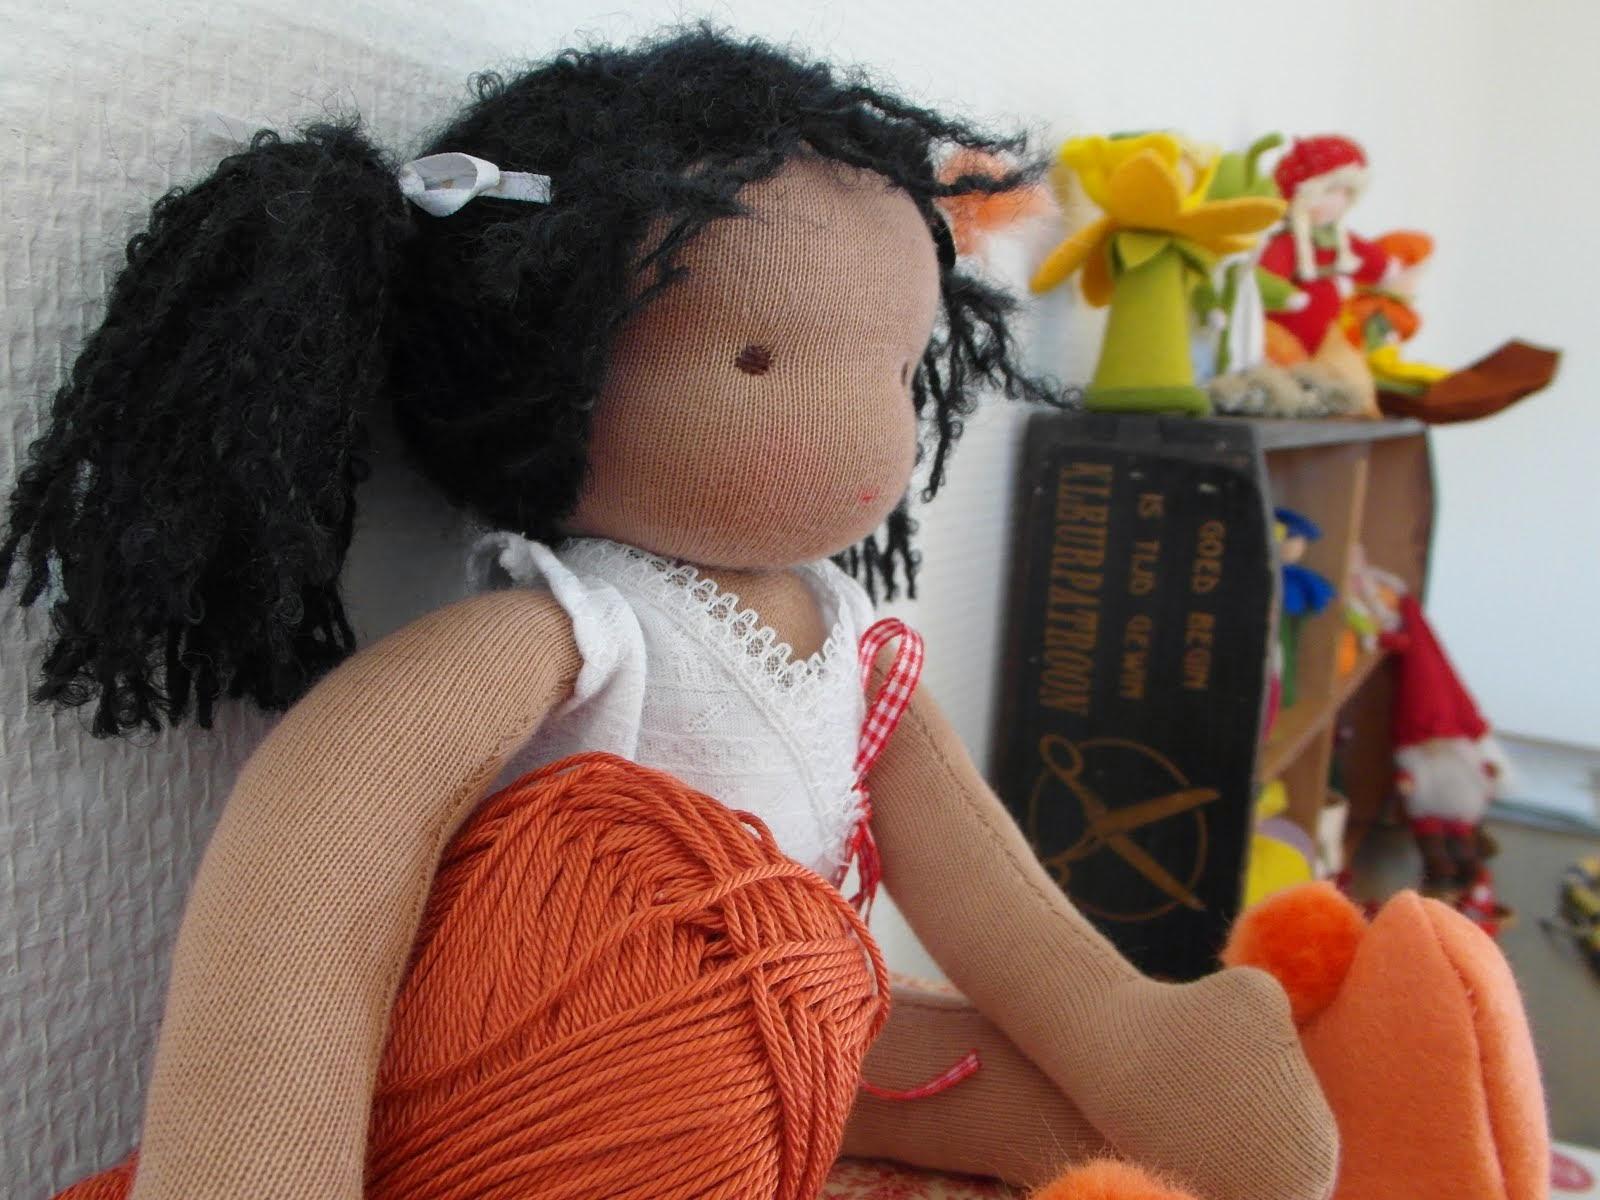 pop 30 cm/doll 11 inch